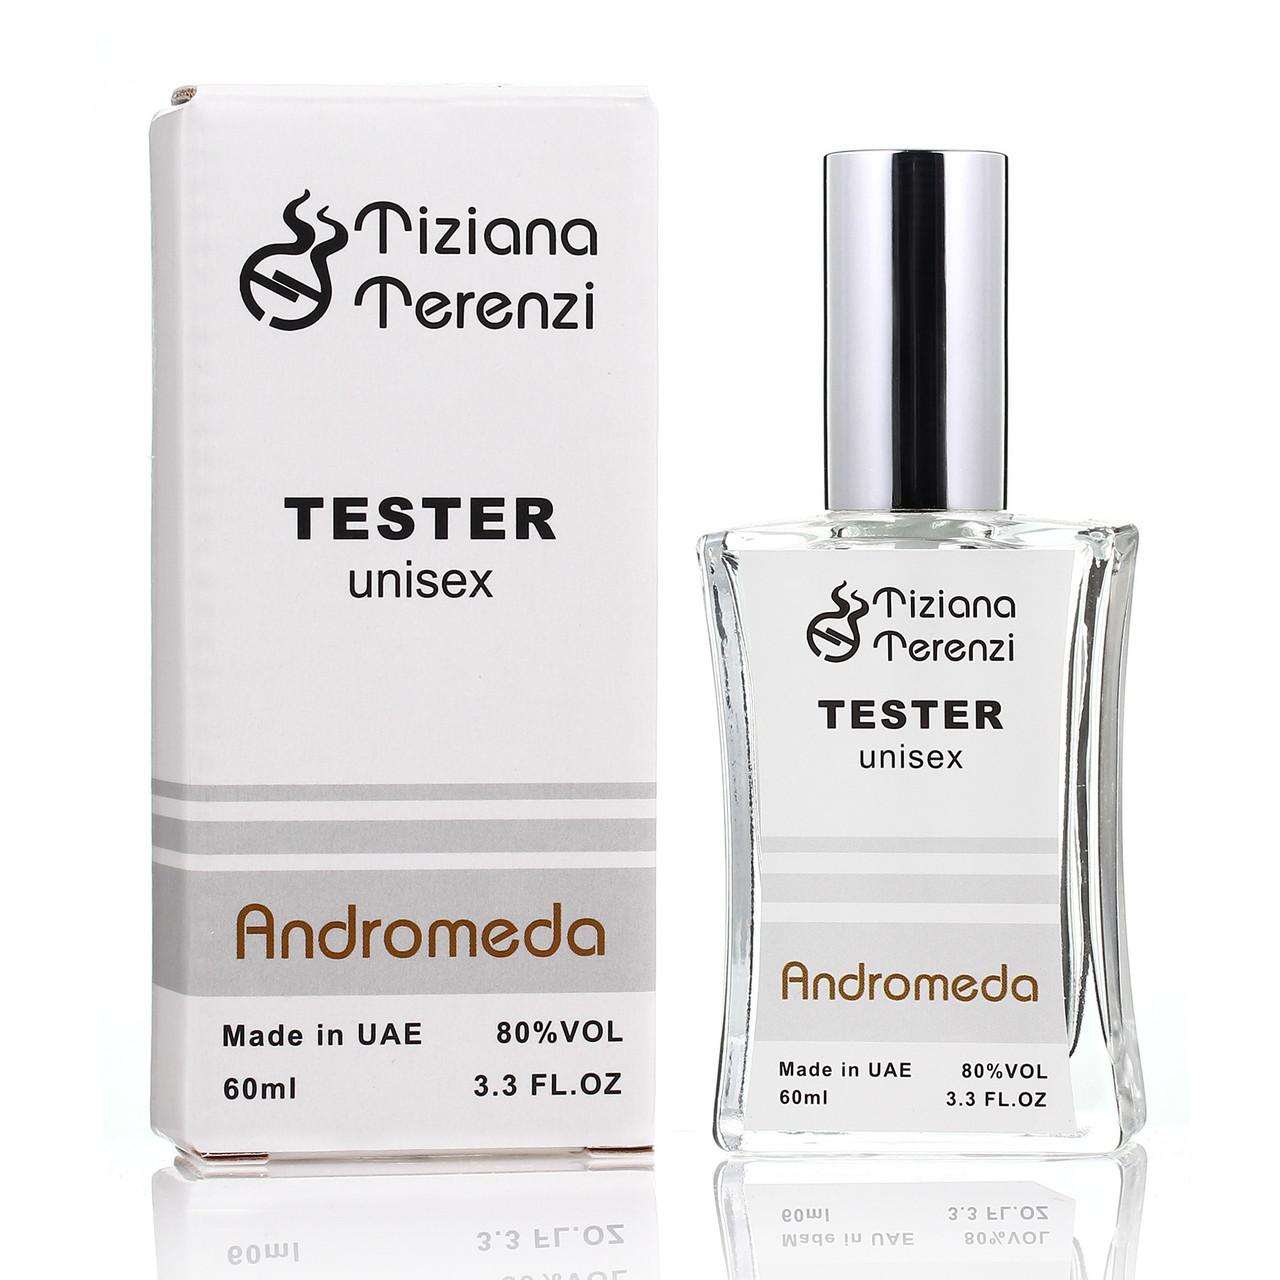 Тестер Tiziana Terenzi Andromeda унисекс, 60 мл